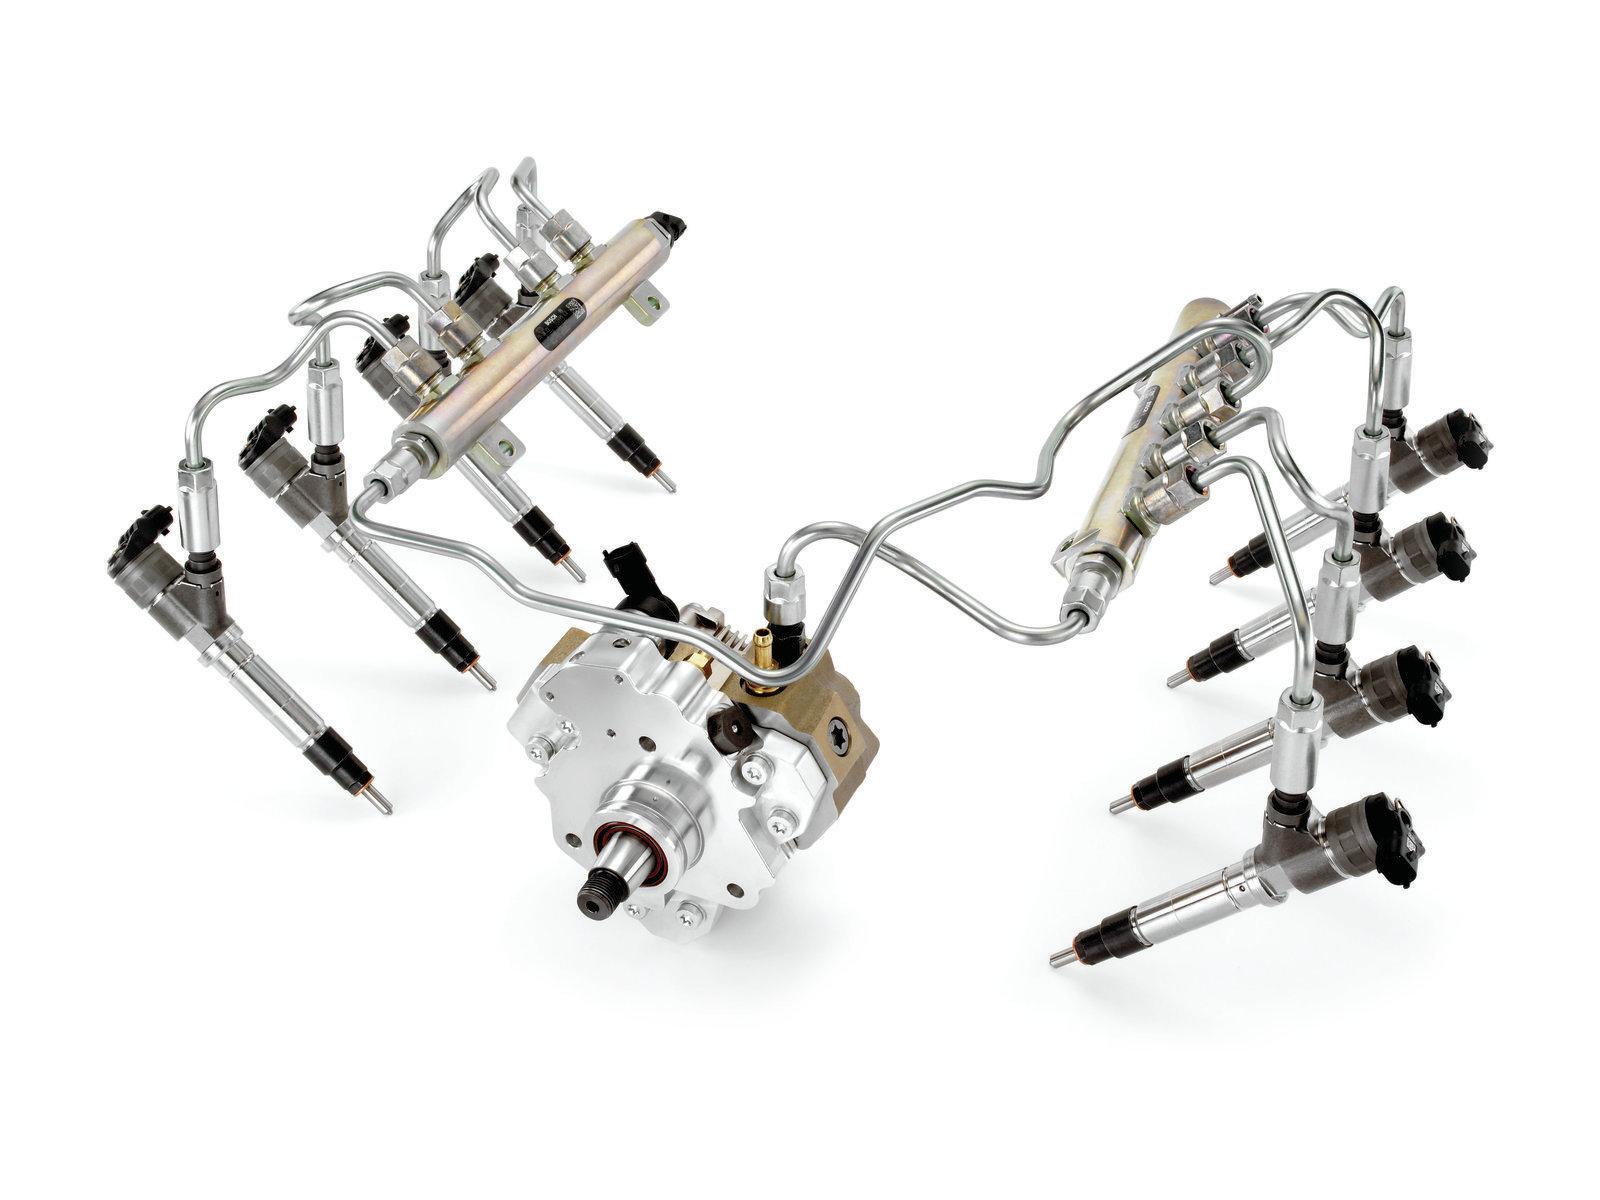 medium resolution of diagram 2000 pontiac montana engine vibration dampener wiring library rh 99 budoshop4you de